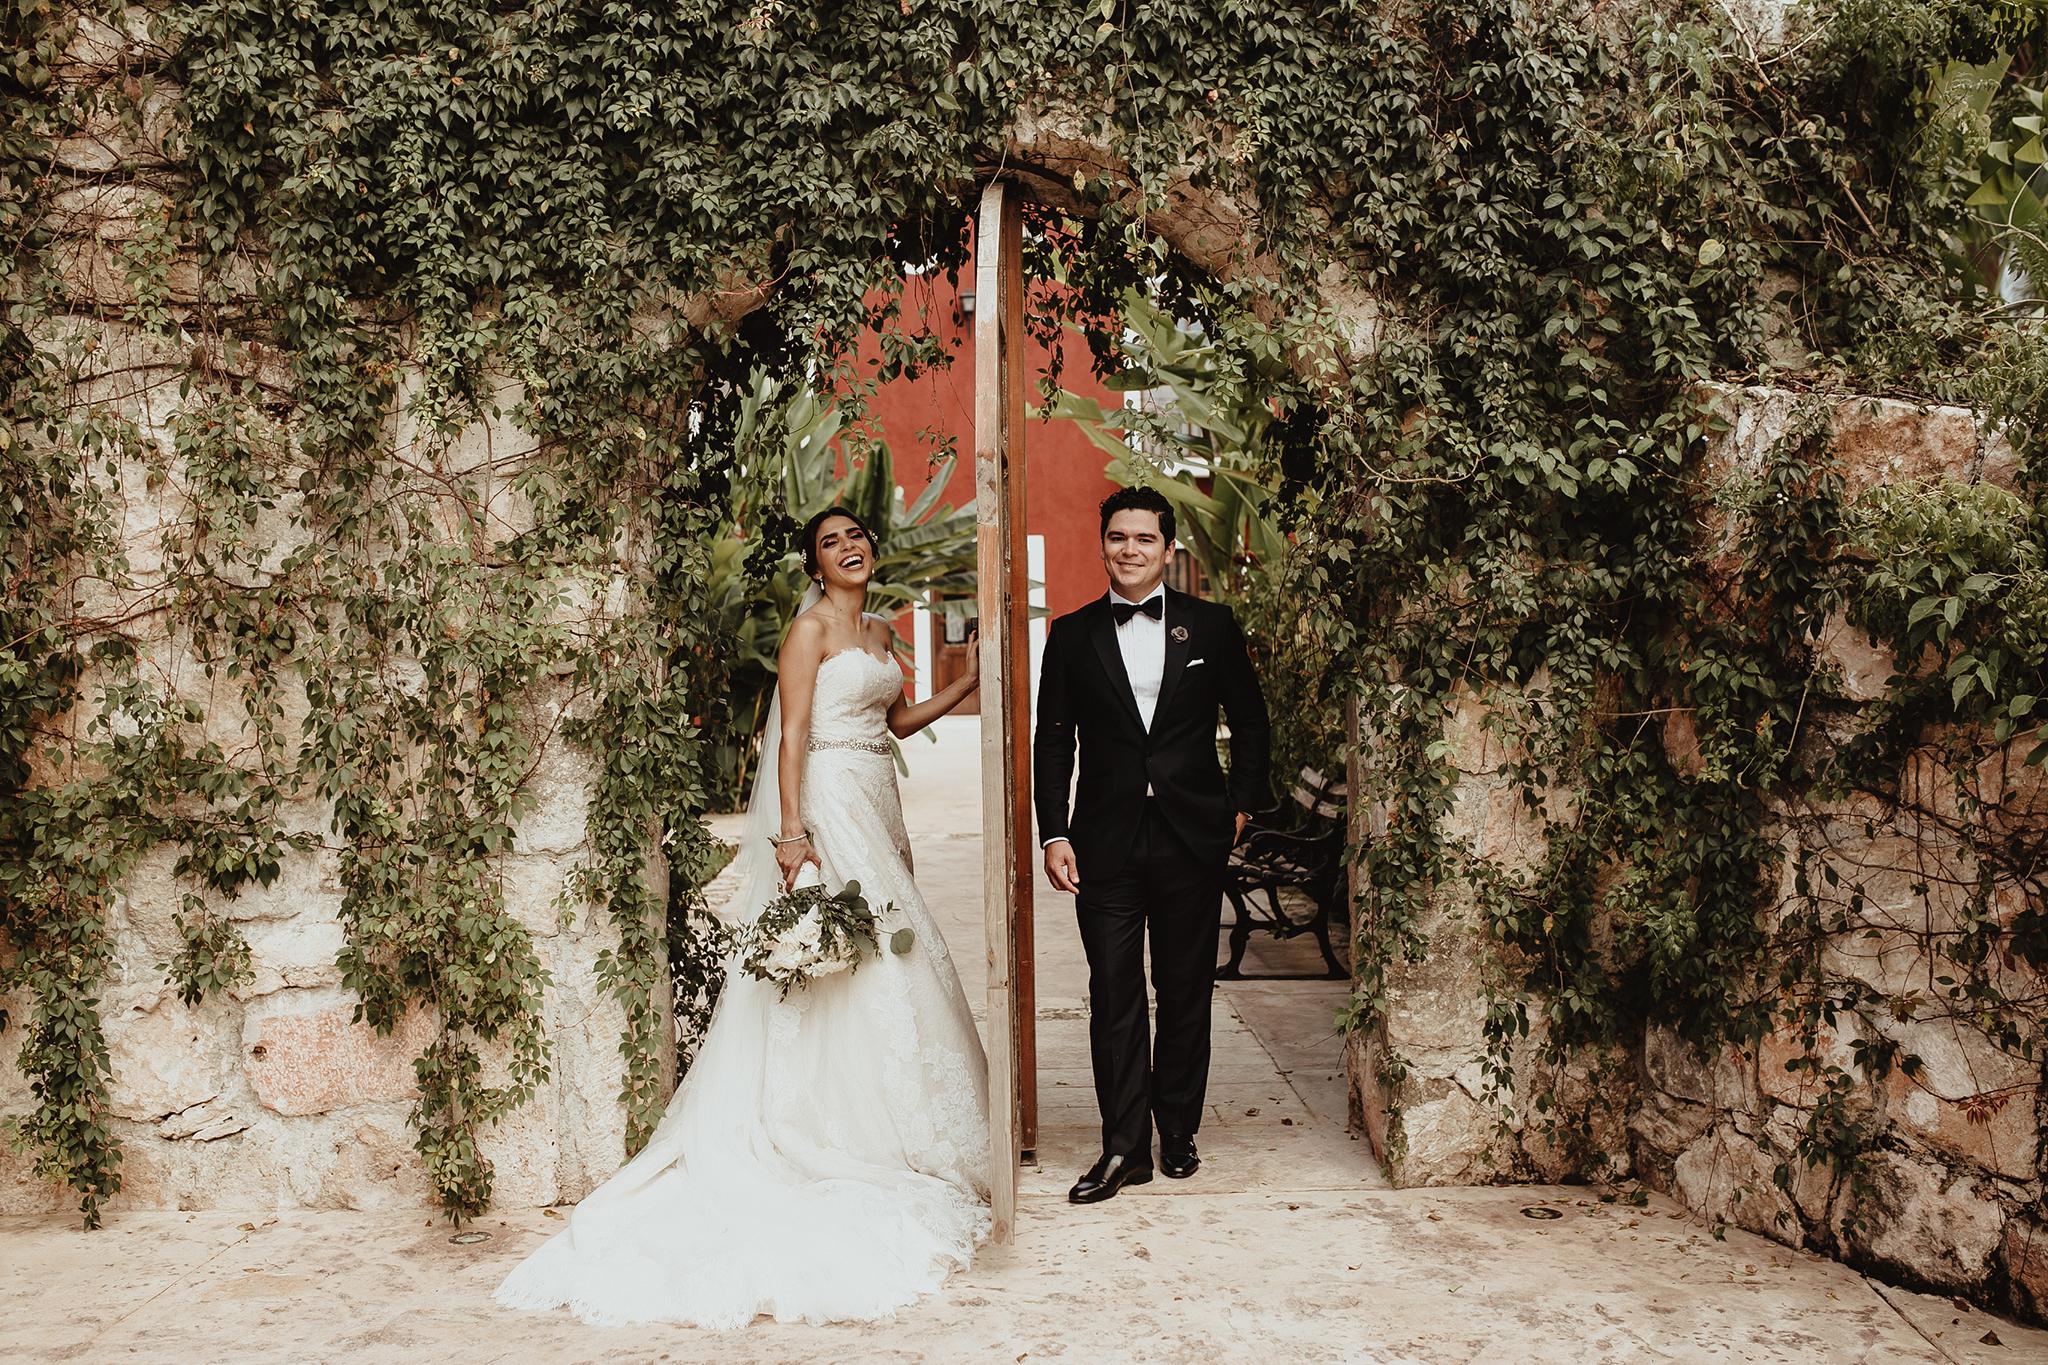 0173F&Yslide_WeddingDstination_MeridaYucatan_HaciendasMerida_BodasMexico_BodasYucatan_Boda_Destino.jpg